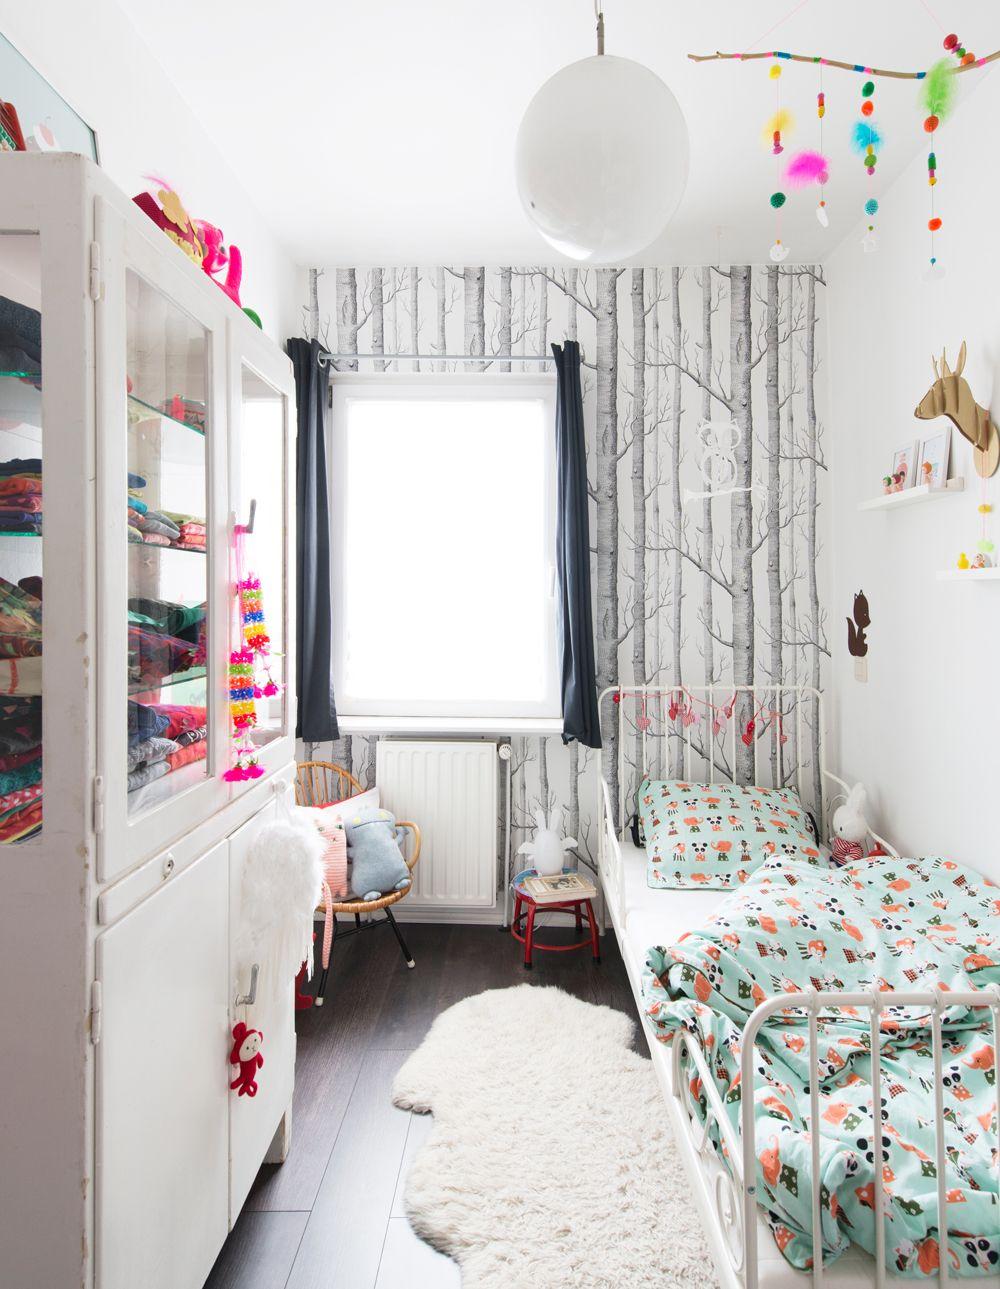 Cole And Son Wallpaper In Children S Room Girls Bedroom Wallpaper Cole And Son Wallpaper Wood Wallpaper Bedroom